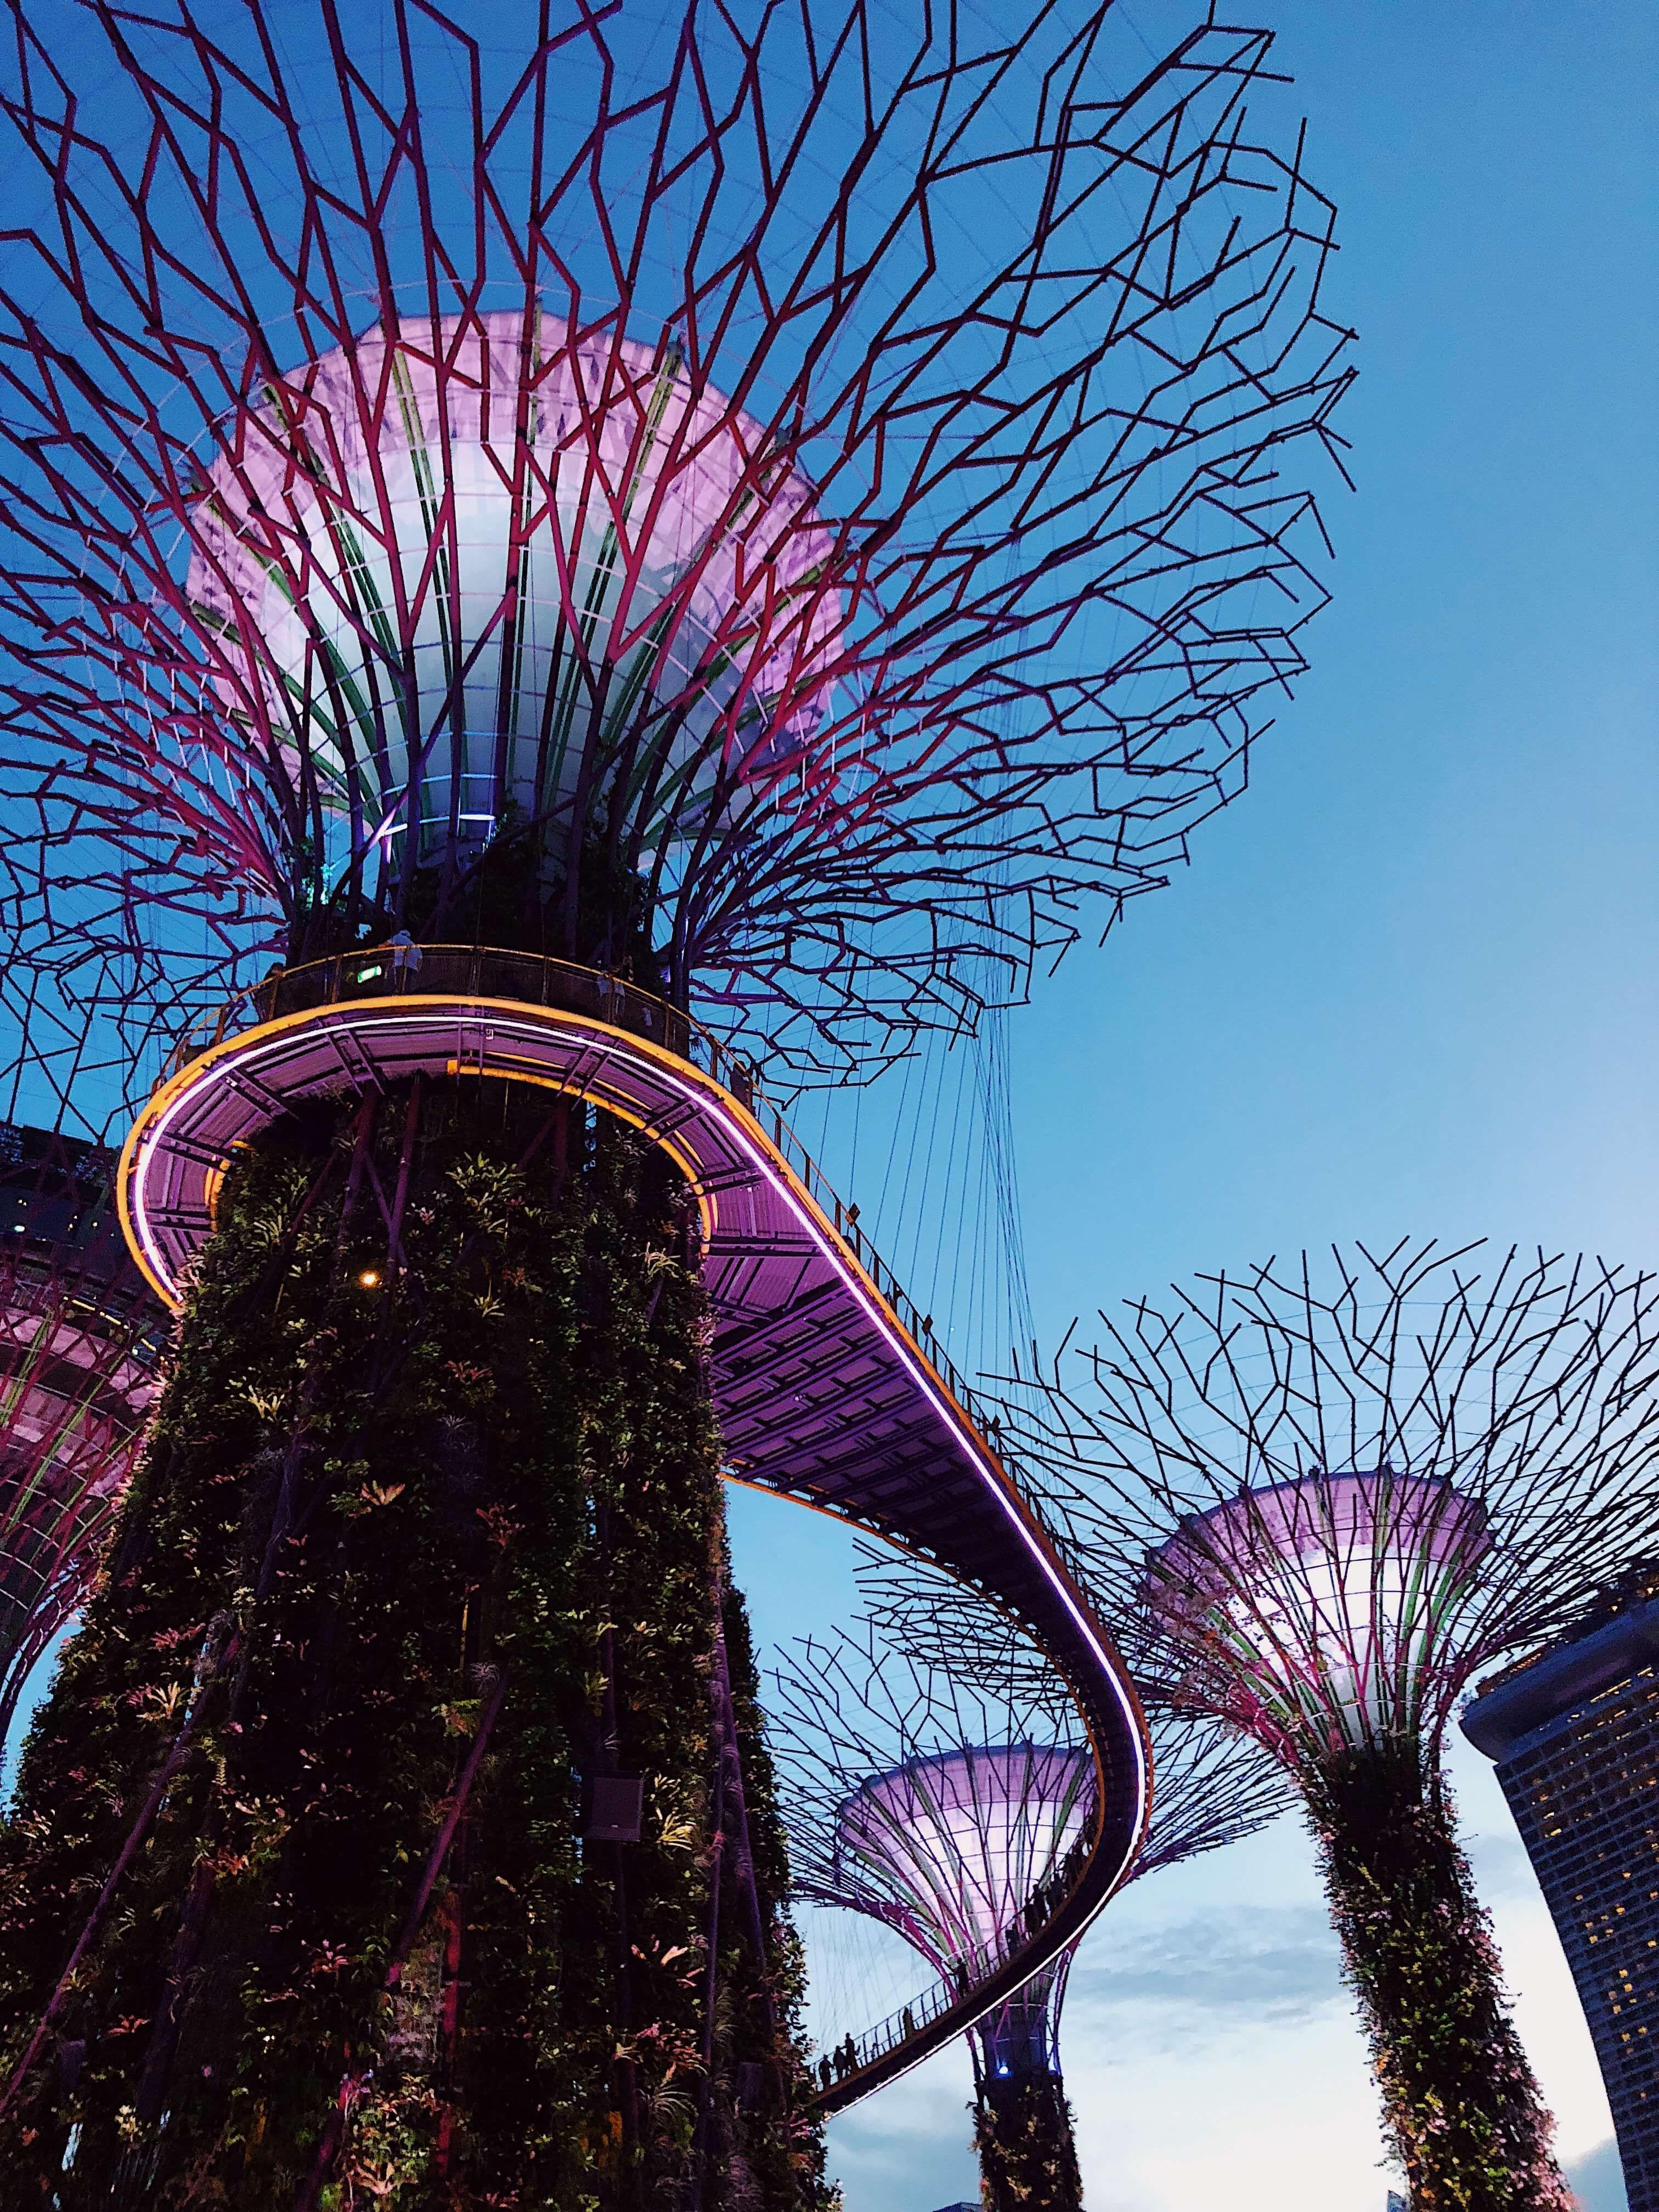 8b2cdcdc96e71d90f1fd70cd8f581aa0 - Supertree Grove Gardens By The Bay Singapore